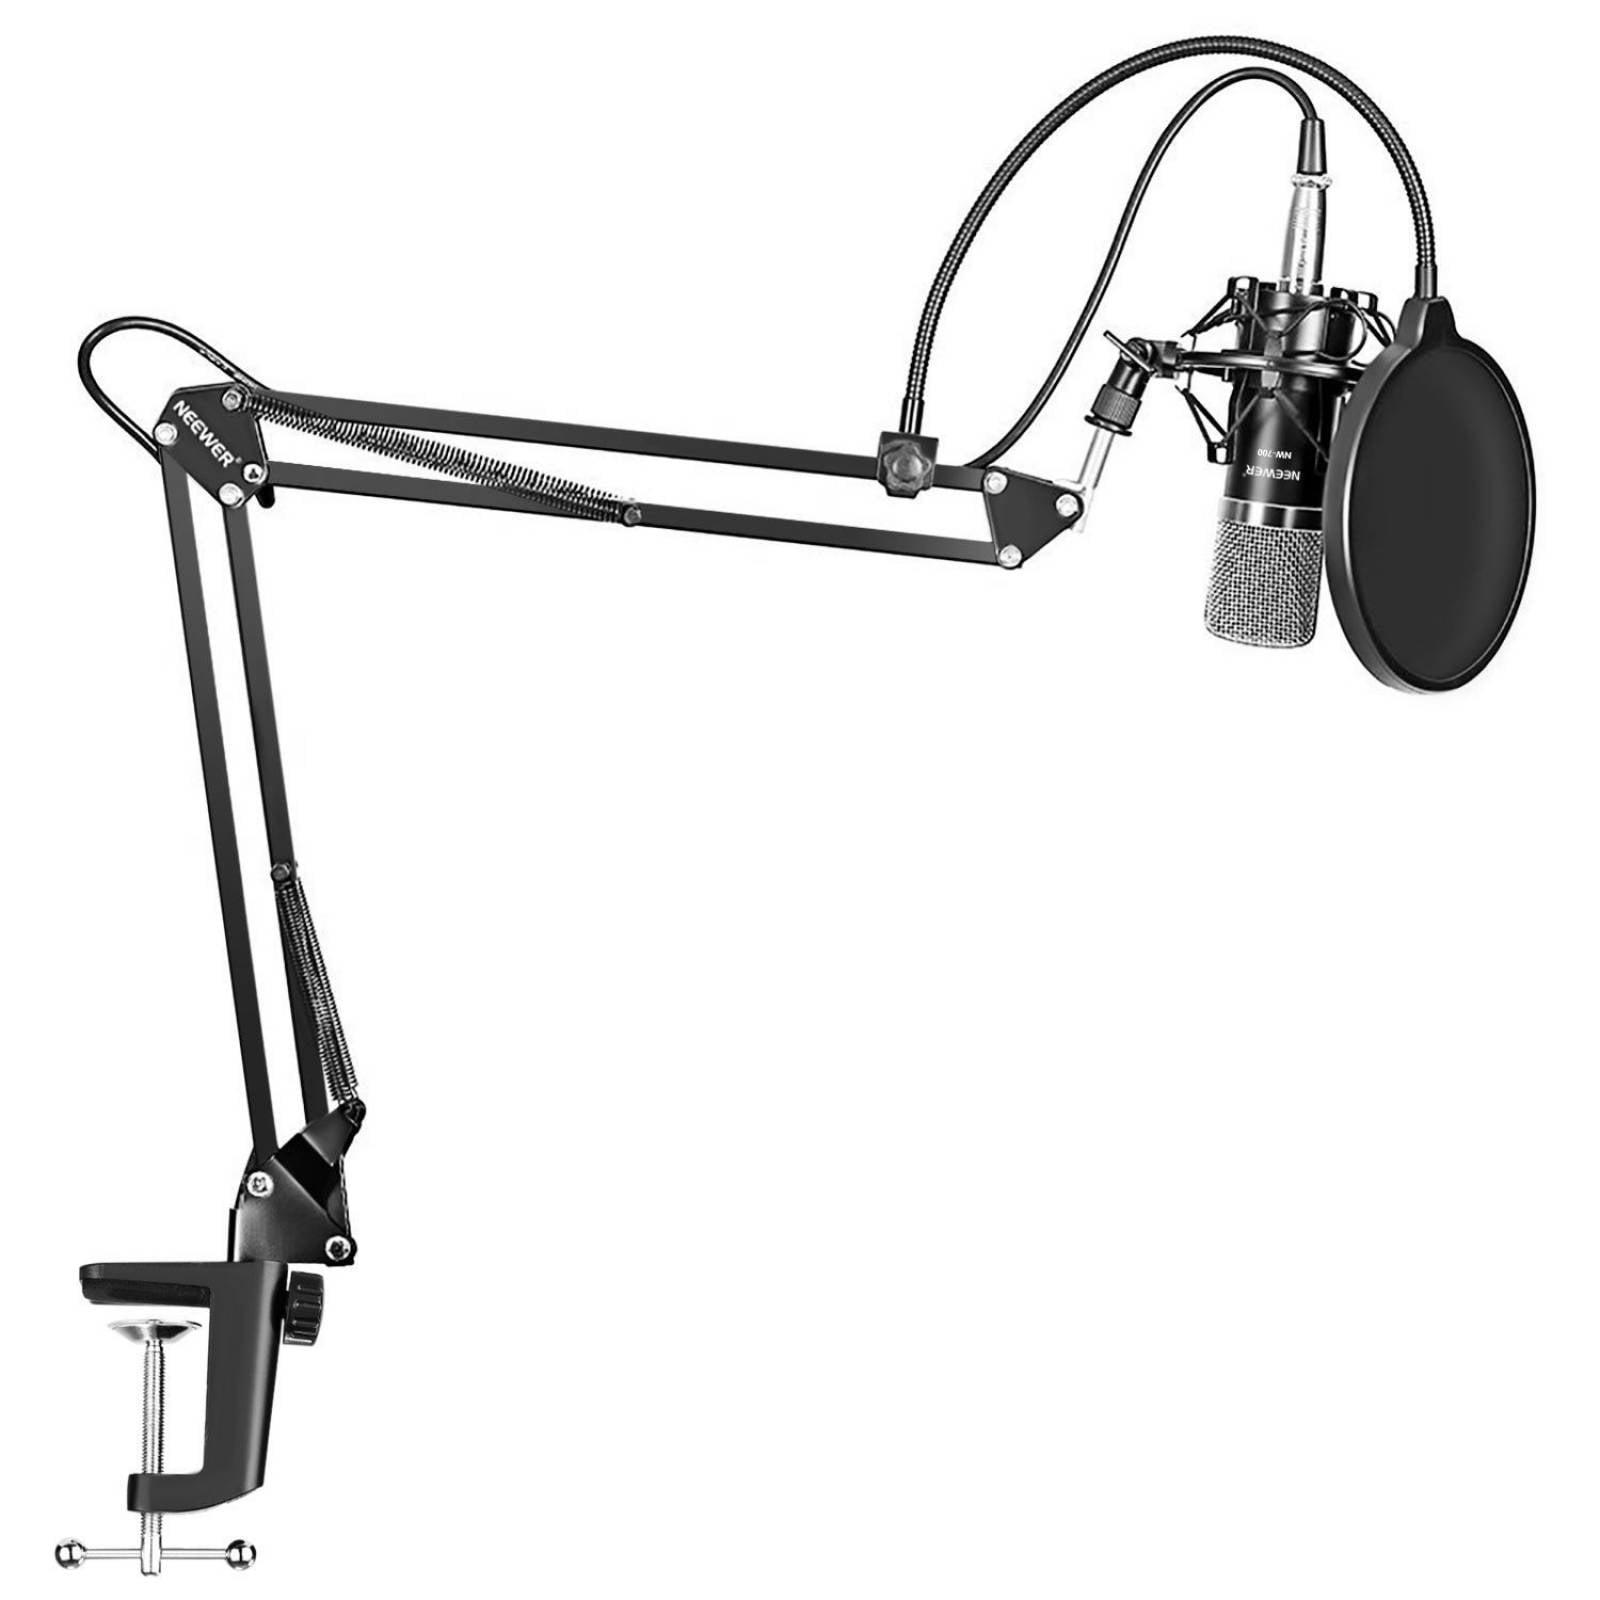 Microfono Prof Neewer NW-700 y Suspension Ajustable NW-35